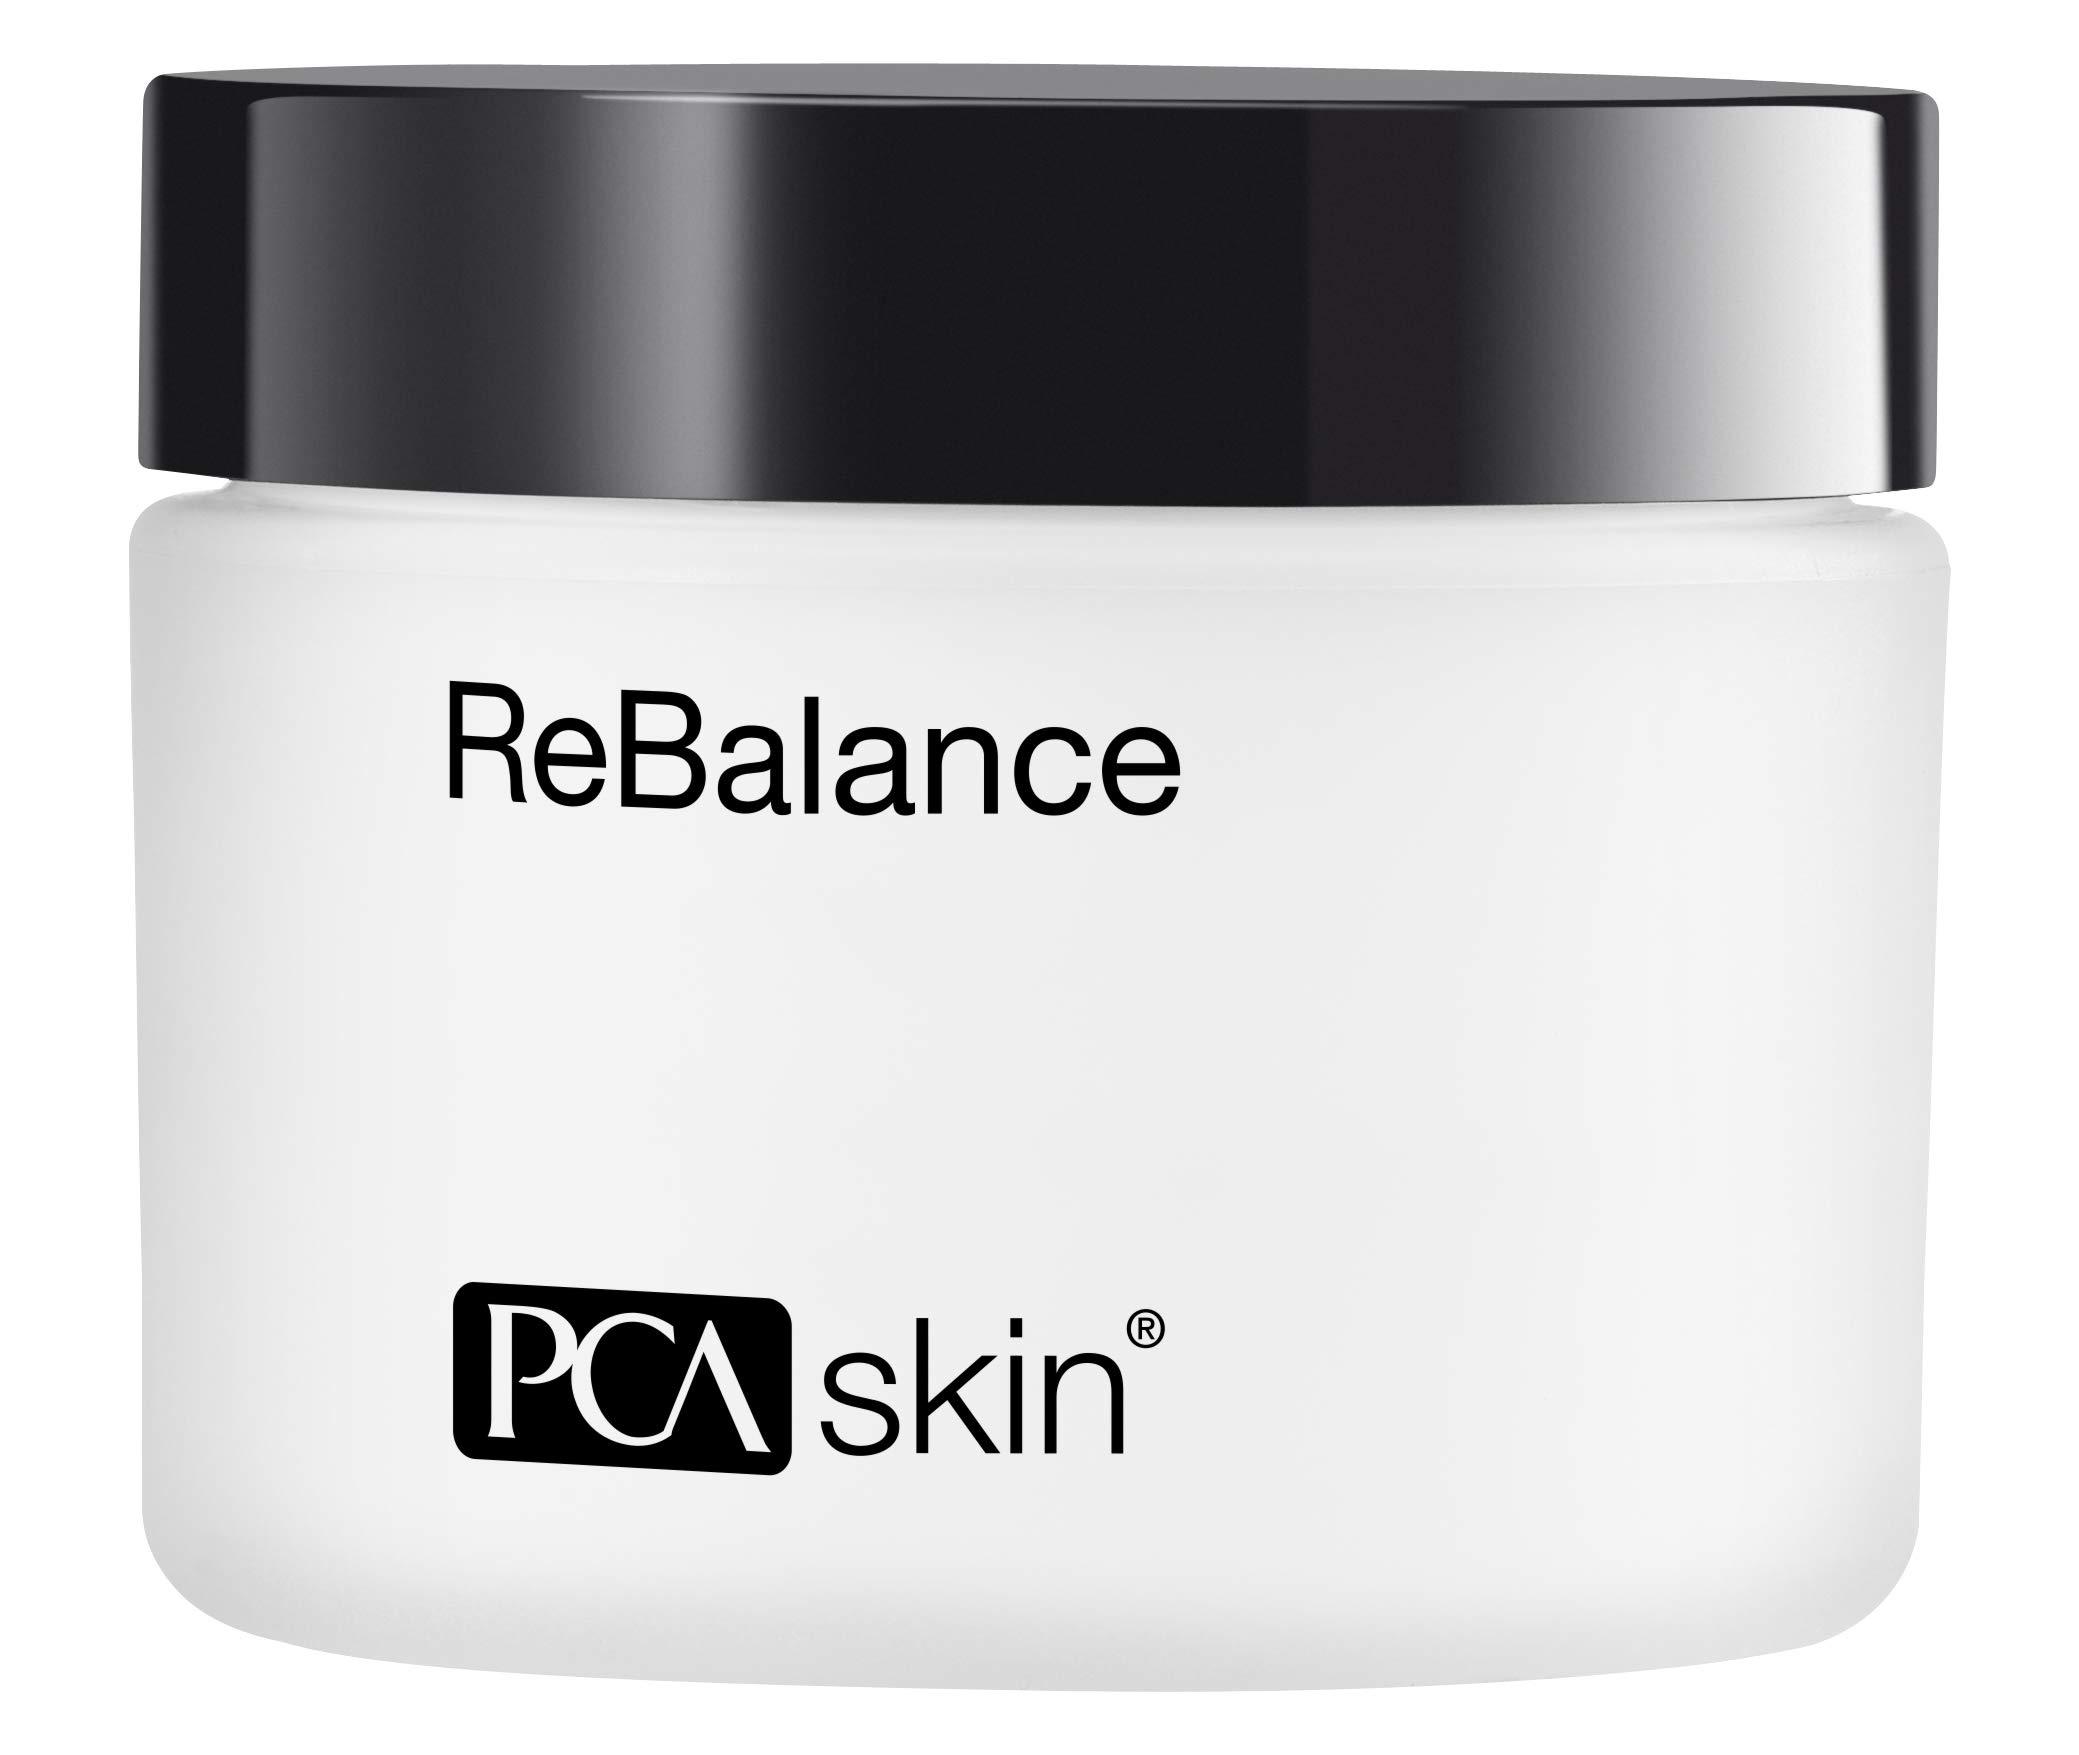 PCA SKIN ReBalance, Lightweight Calming Face Cream with Niacinamide , 1.7 oz.